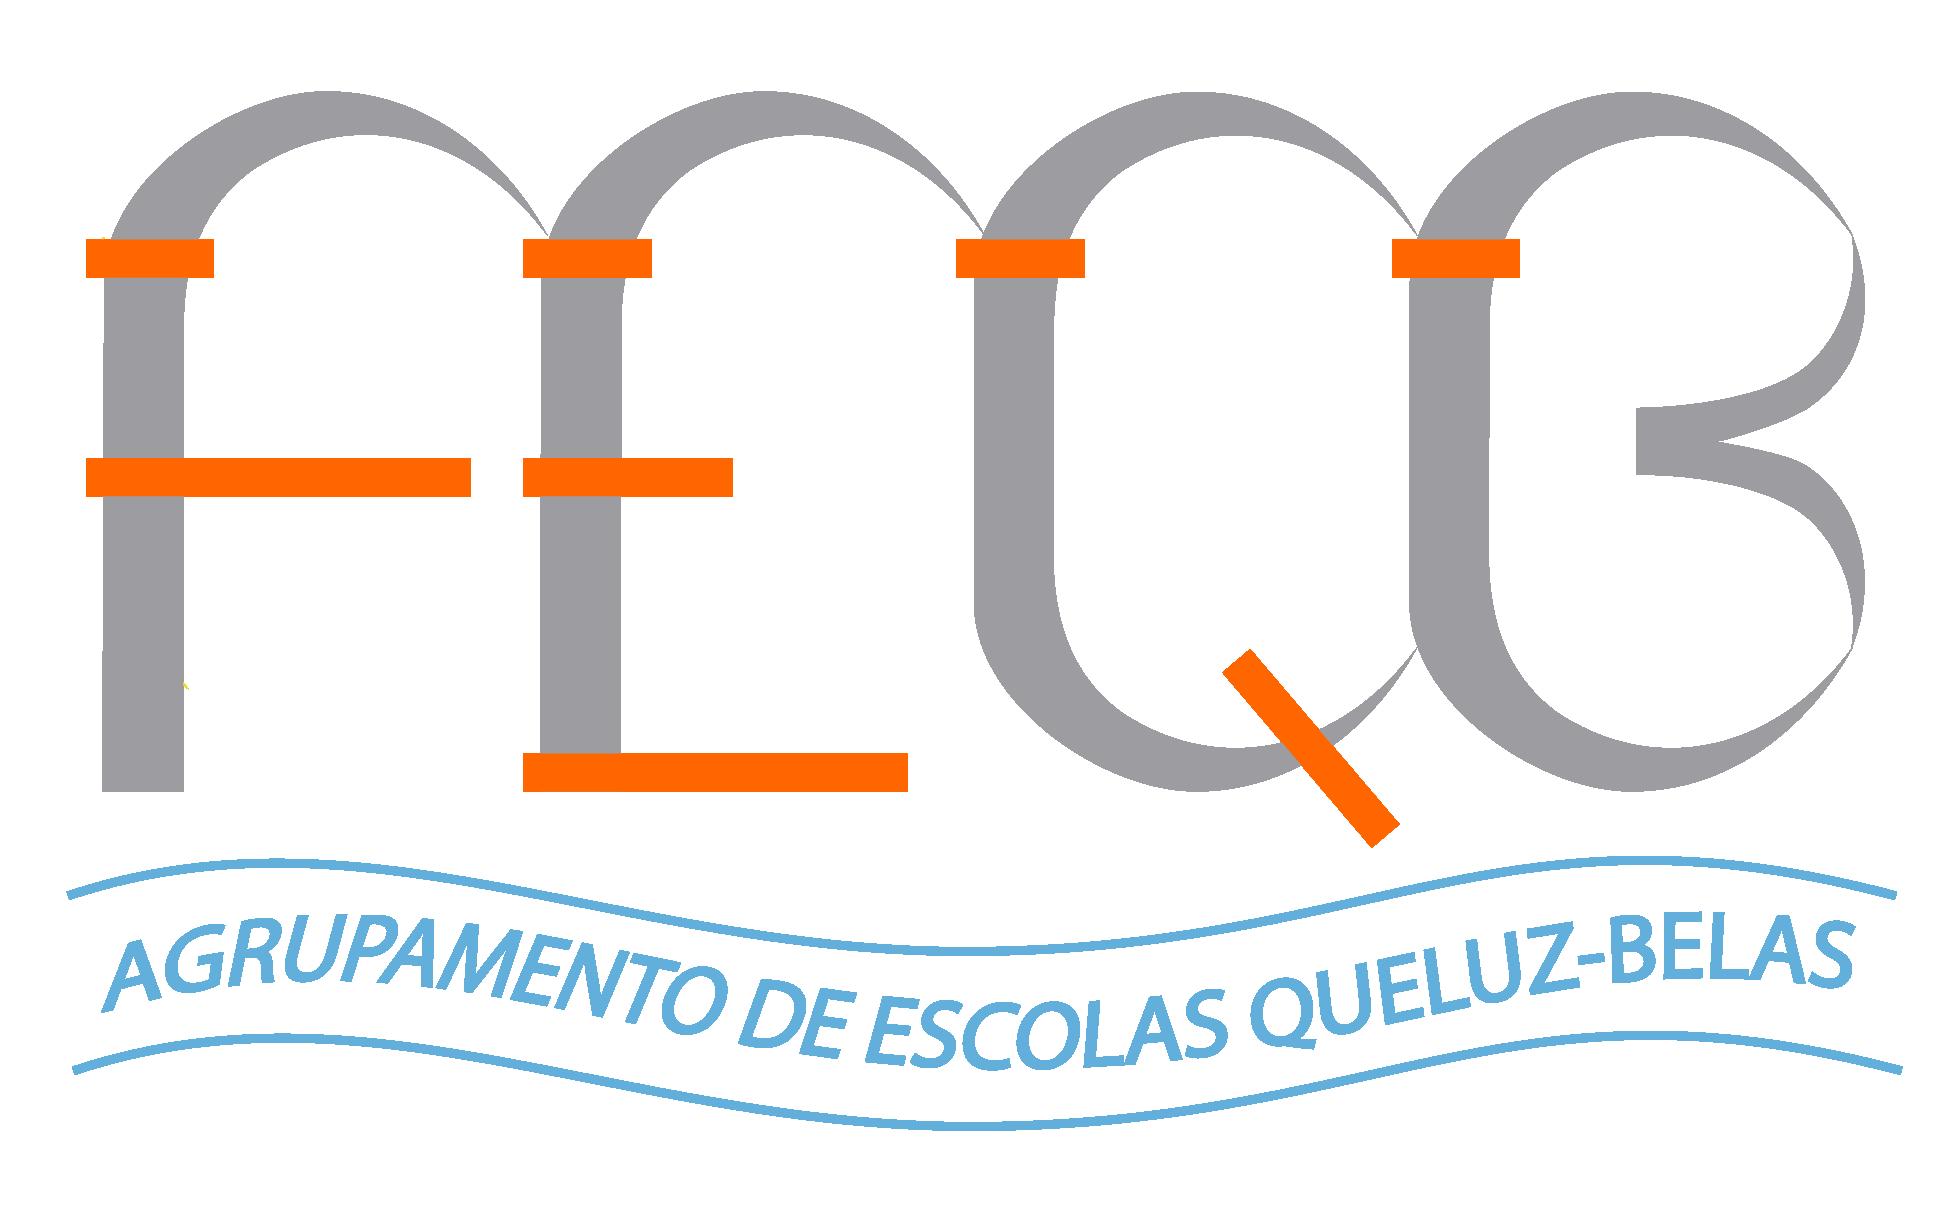 AEQB | Agrupamento de Escolas Queluz-Belas